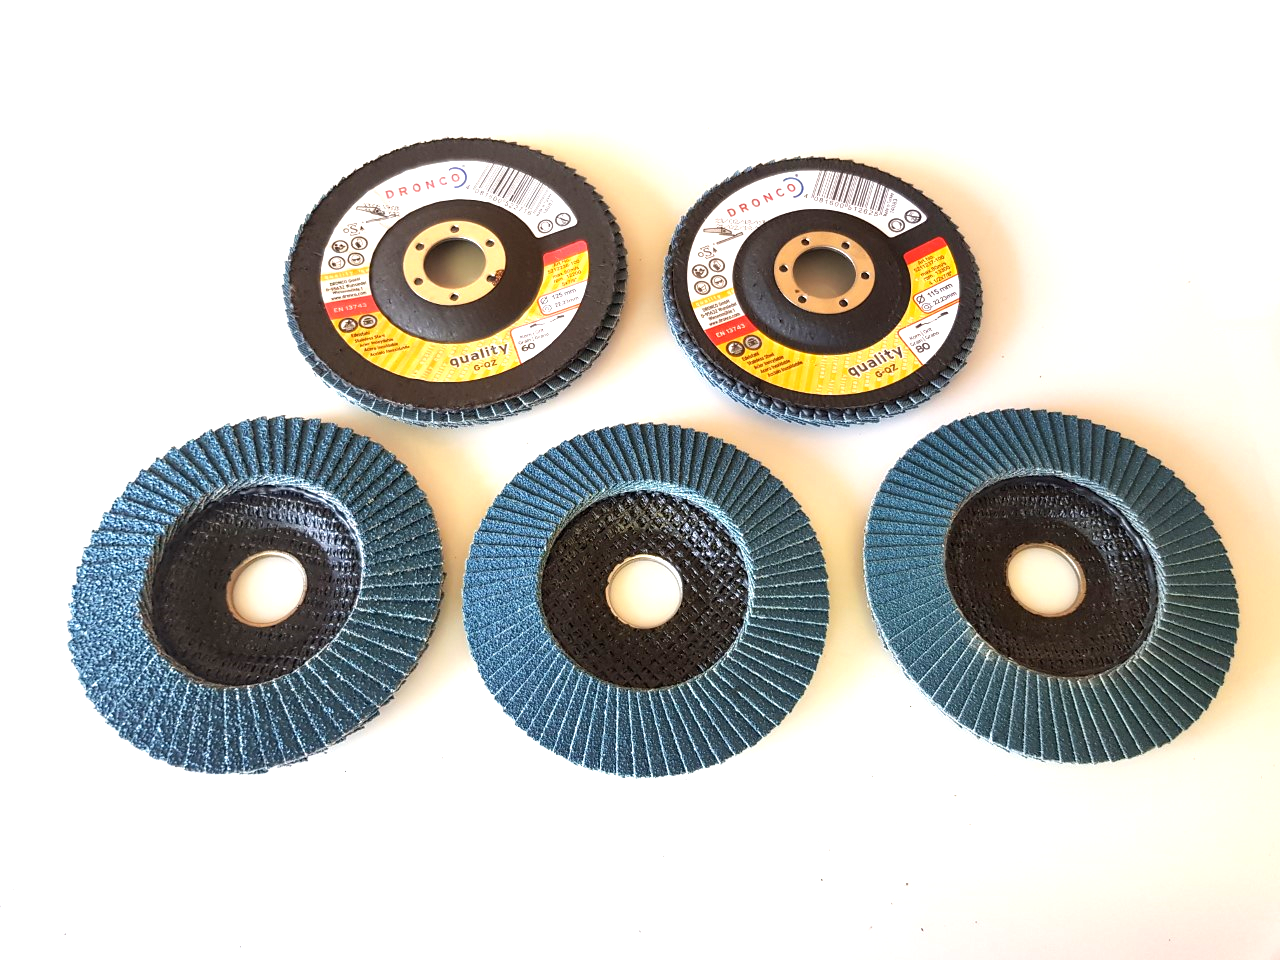 80 Grit Dronco Zircon Power 115mm Zirconium Flap Disc Quality 40 60